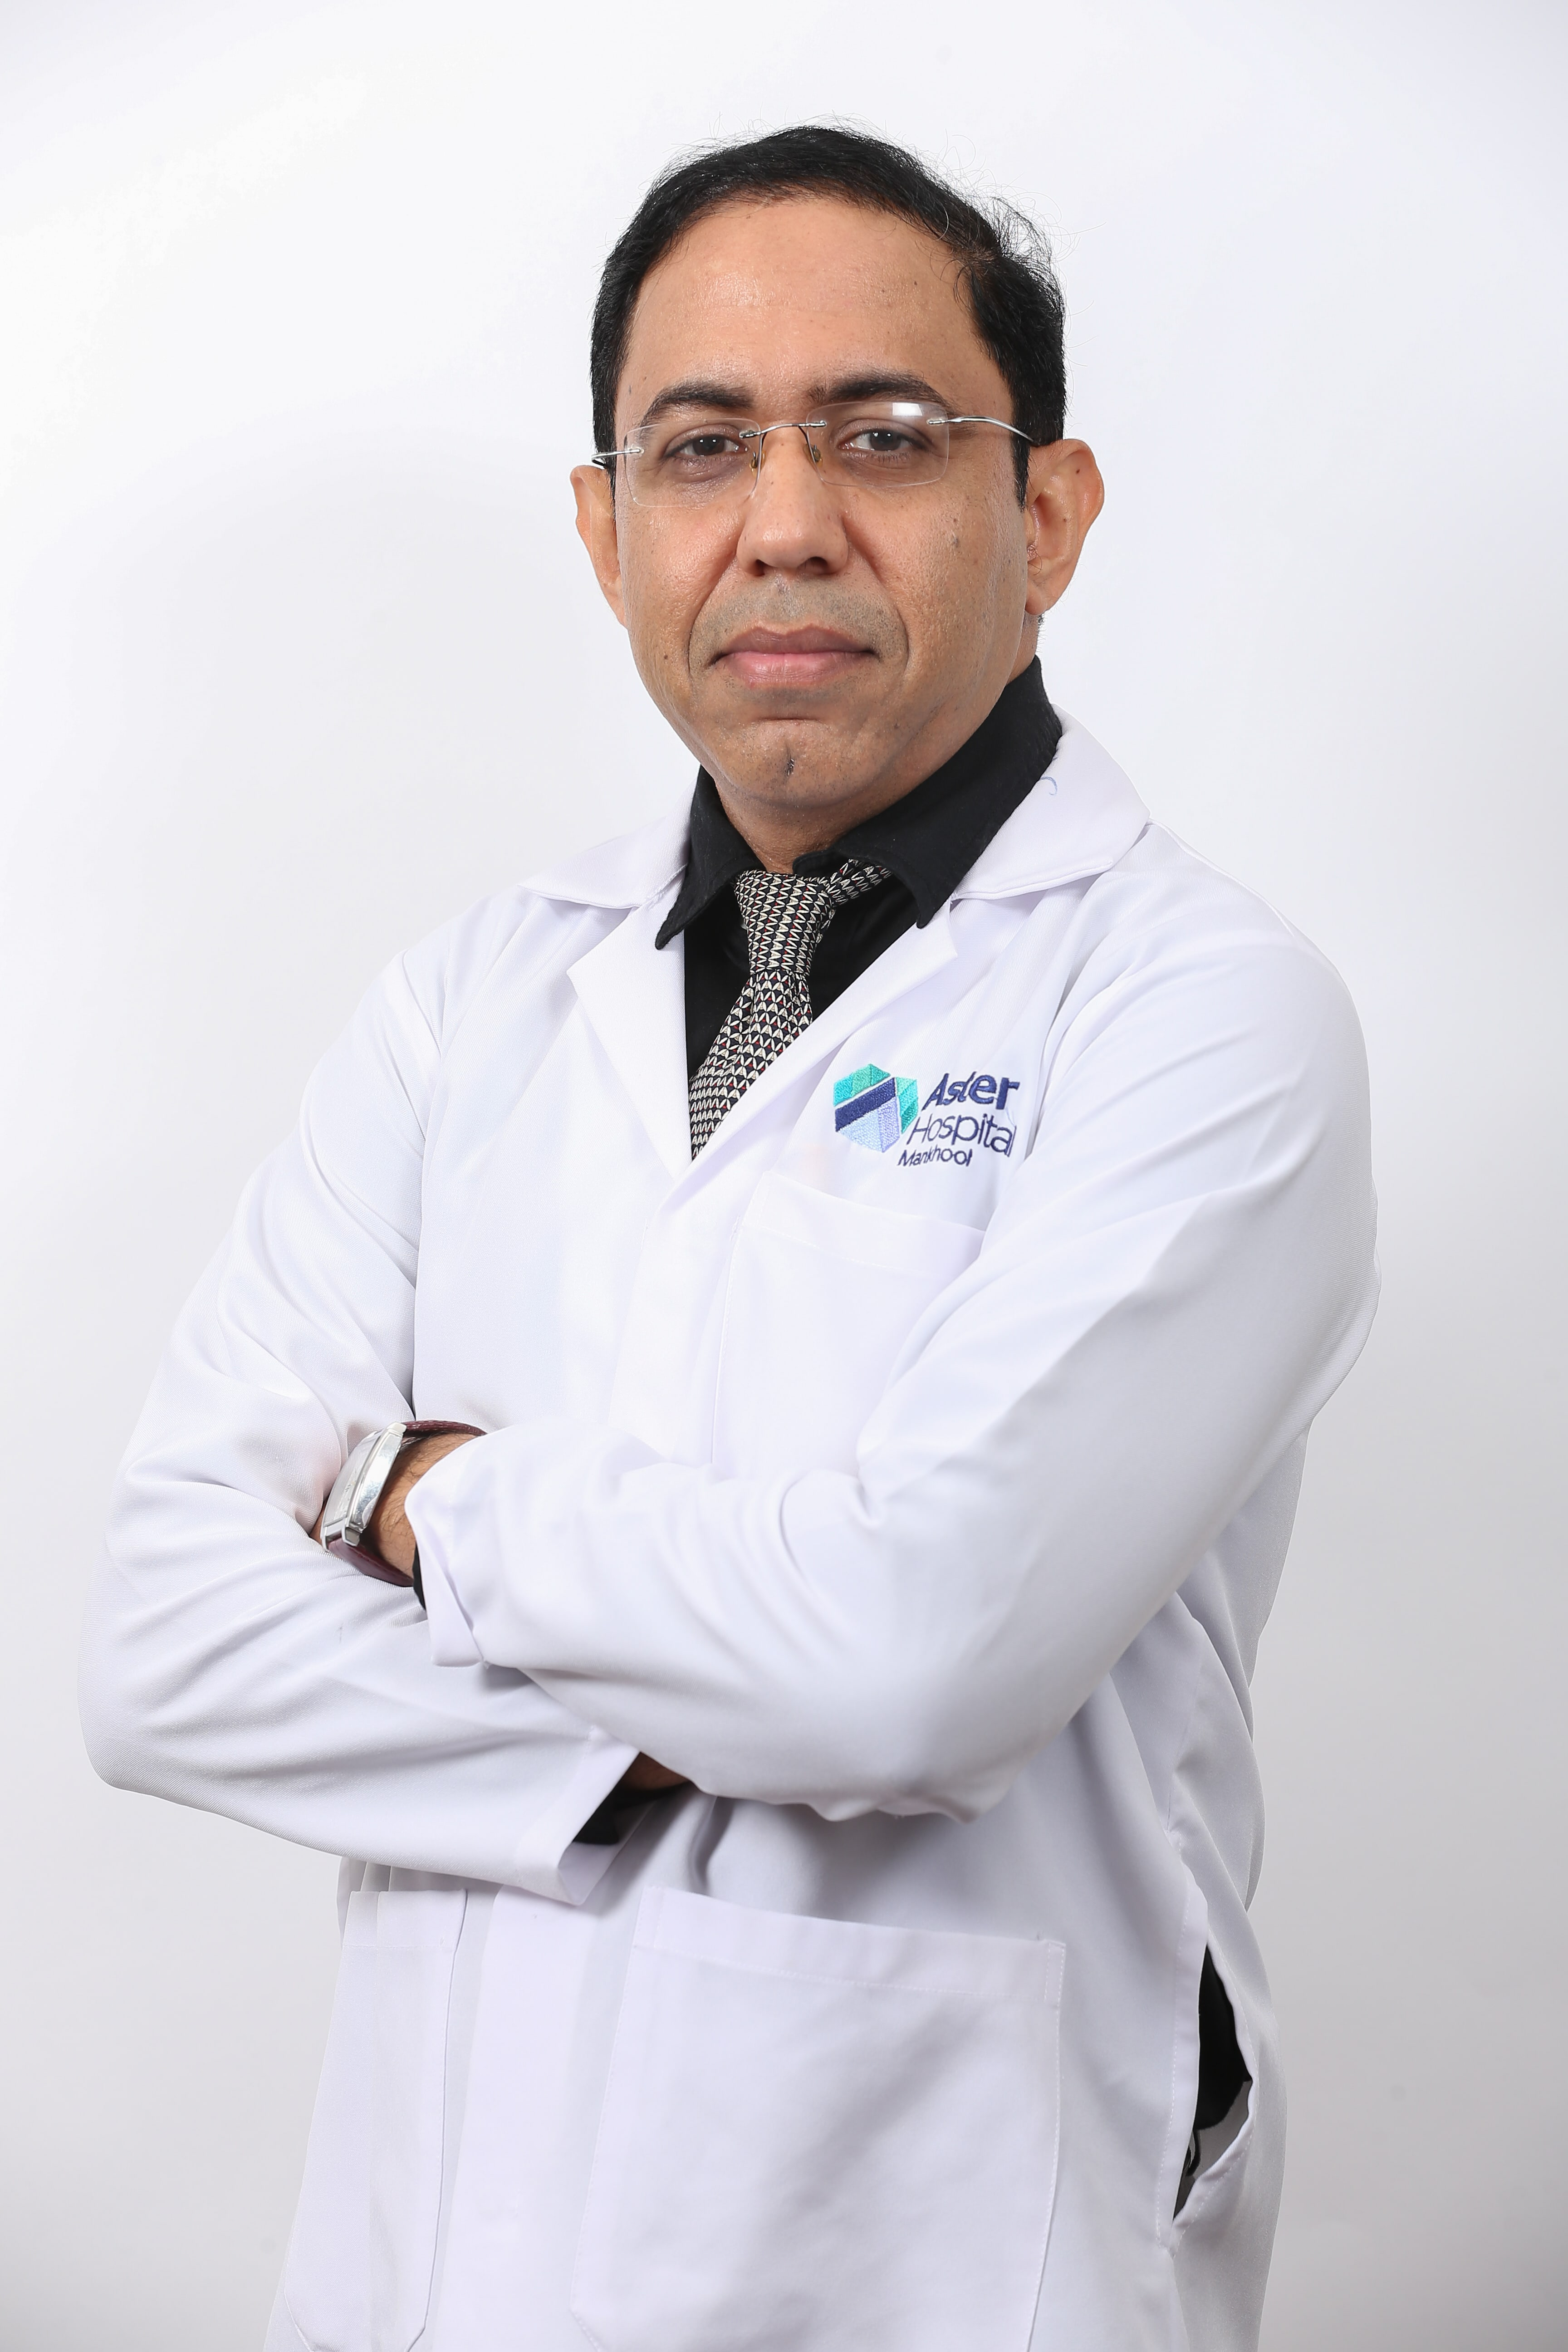 Dr Rahul Tugnait